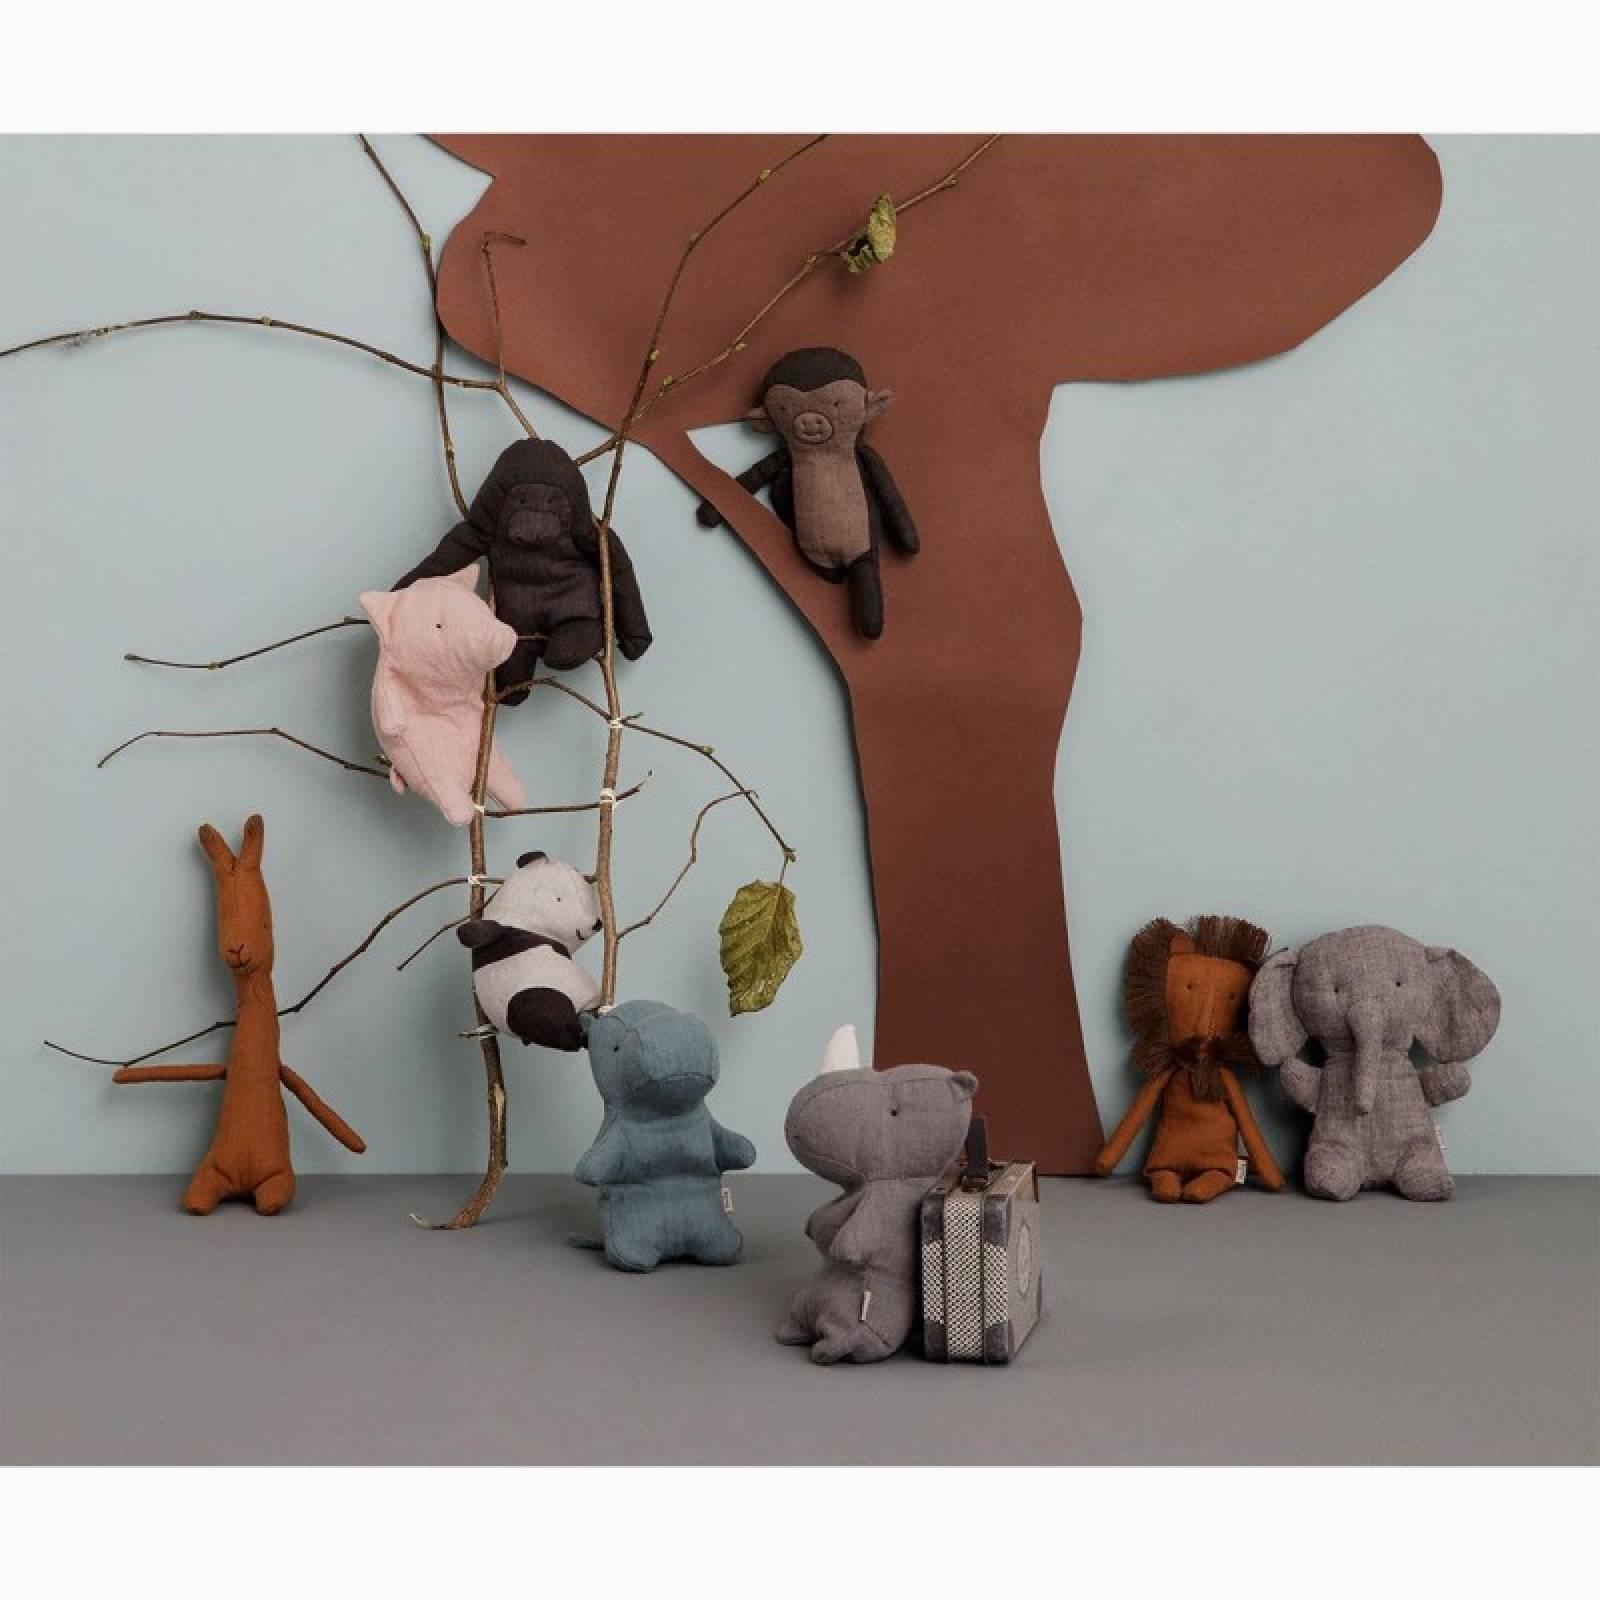 Mini Rhino Soft Toy Noah's Friends By Maileg 0+ thumbnails